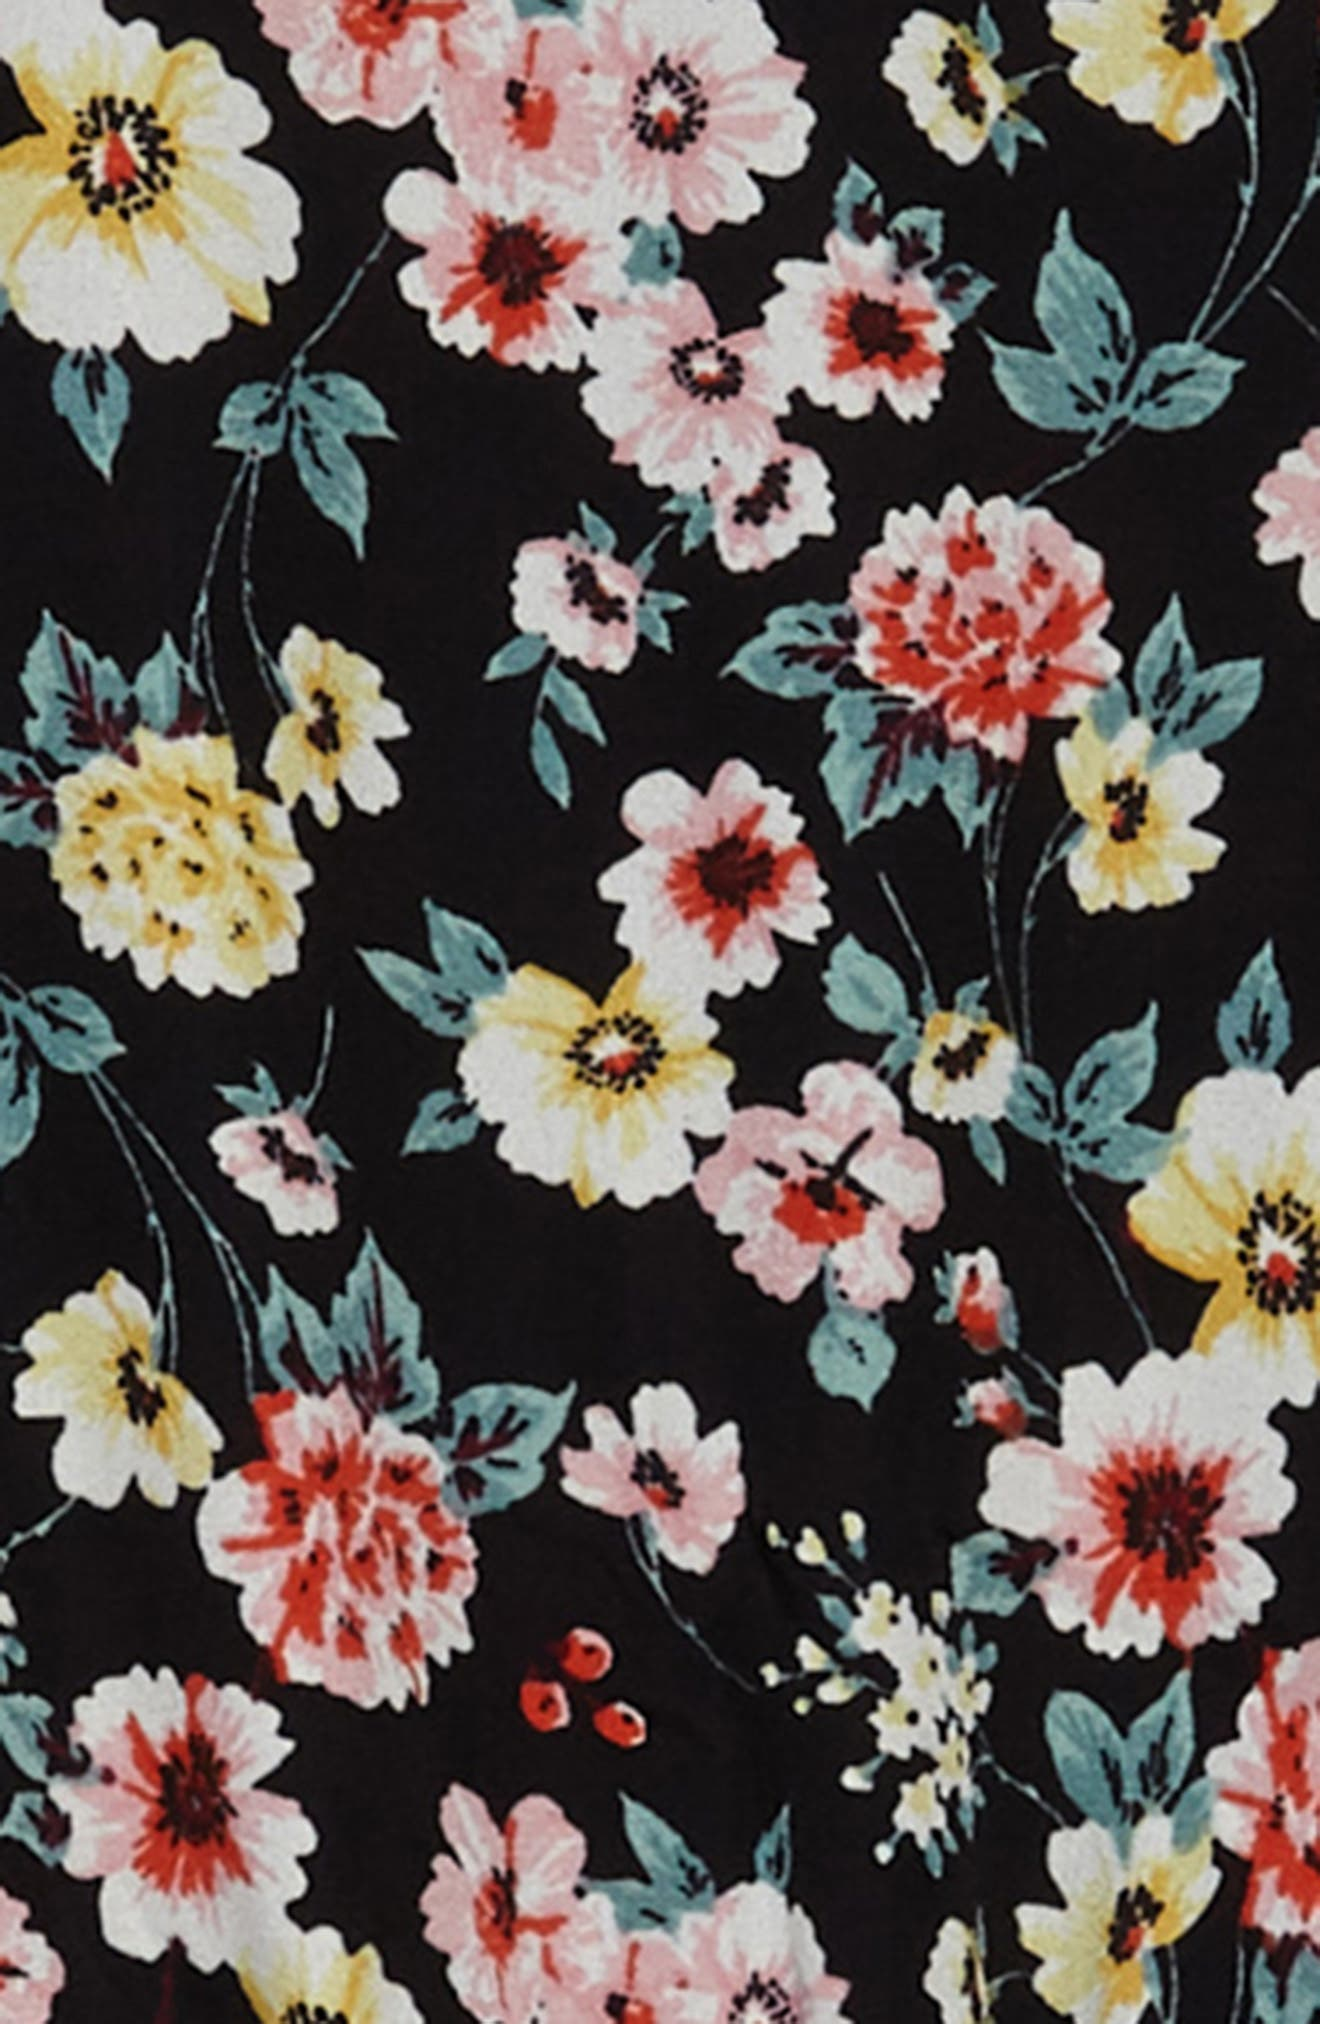 Floral Print Romper,                             Alternate thumbnail 2, color,                             Black Multi